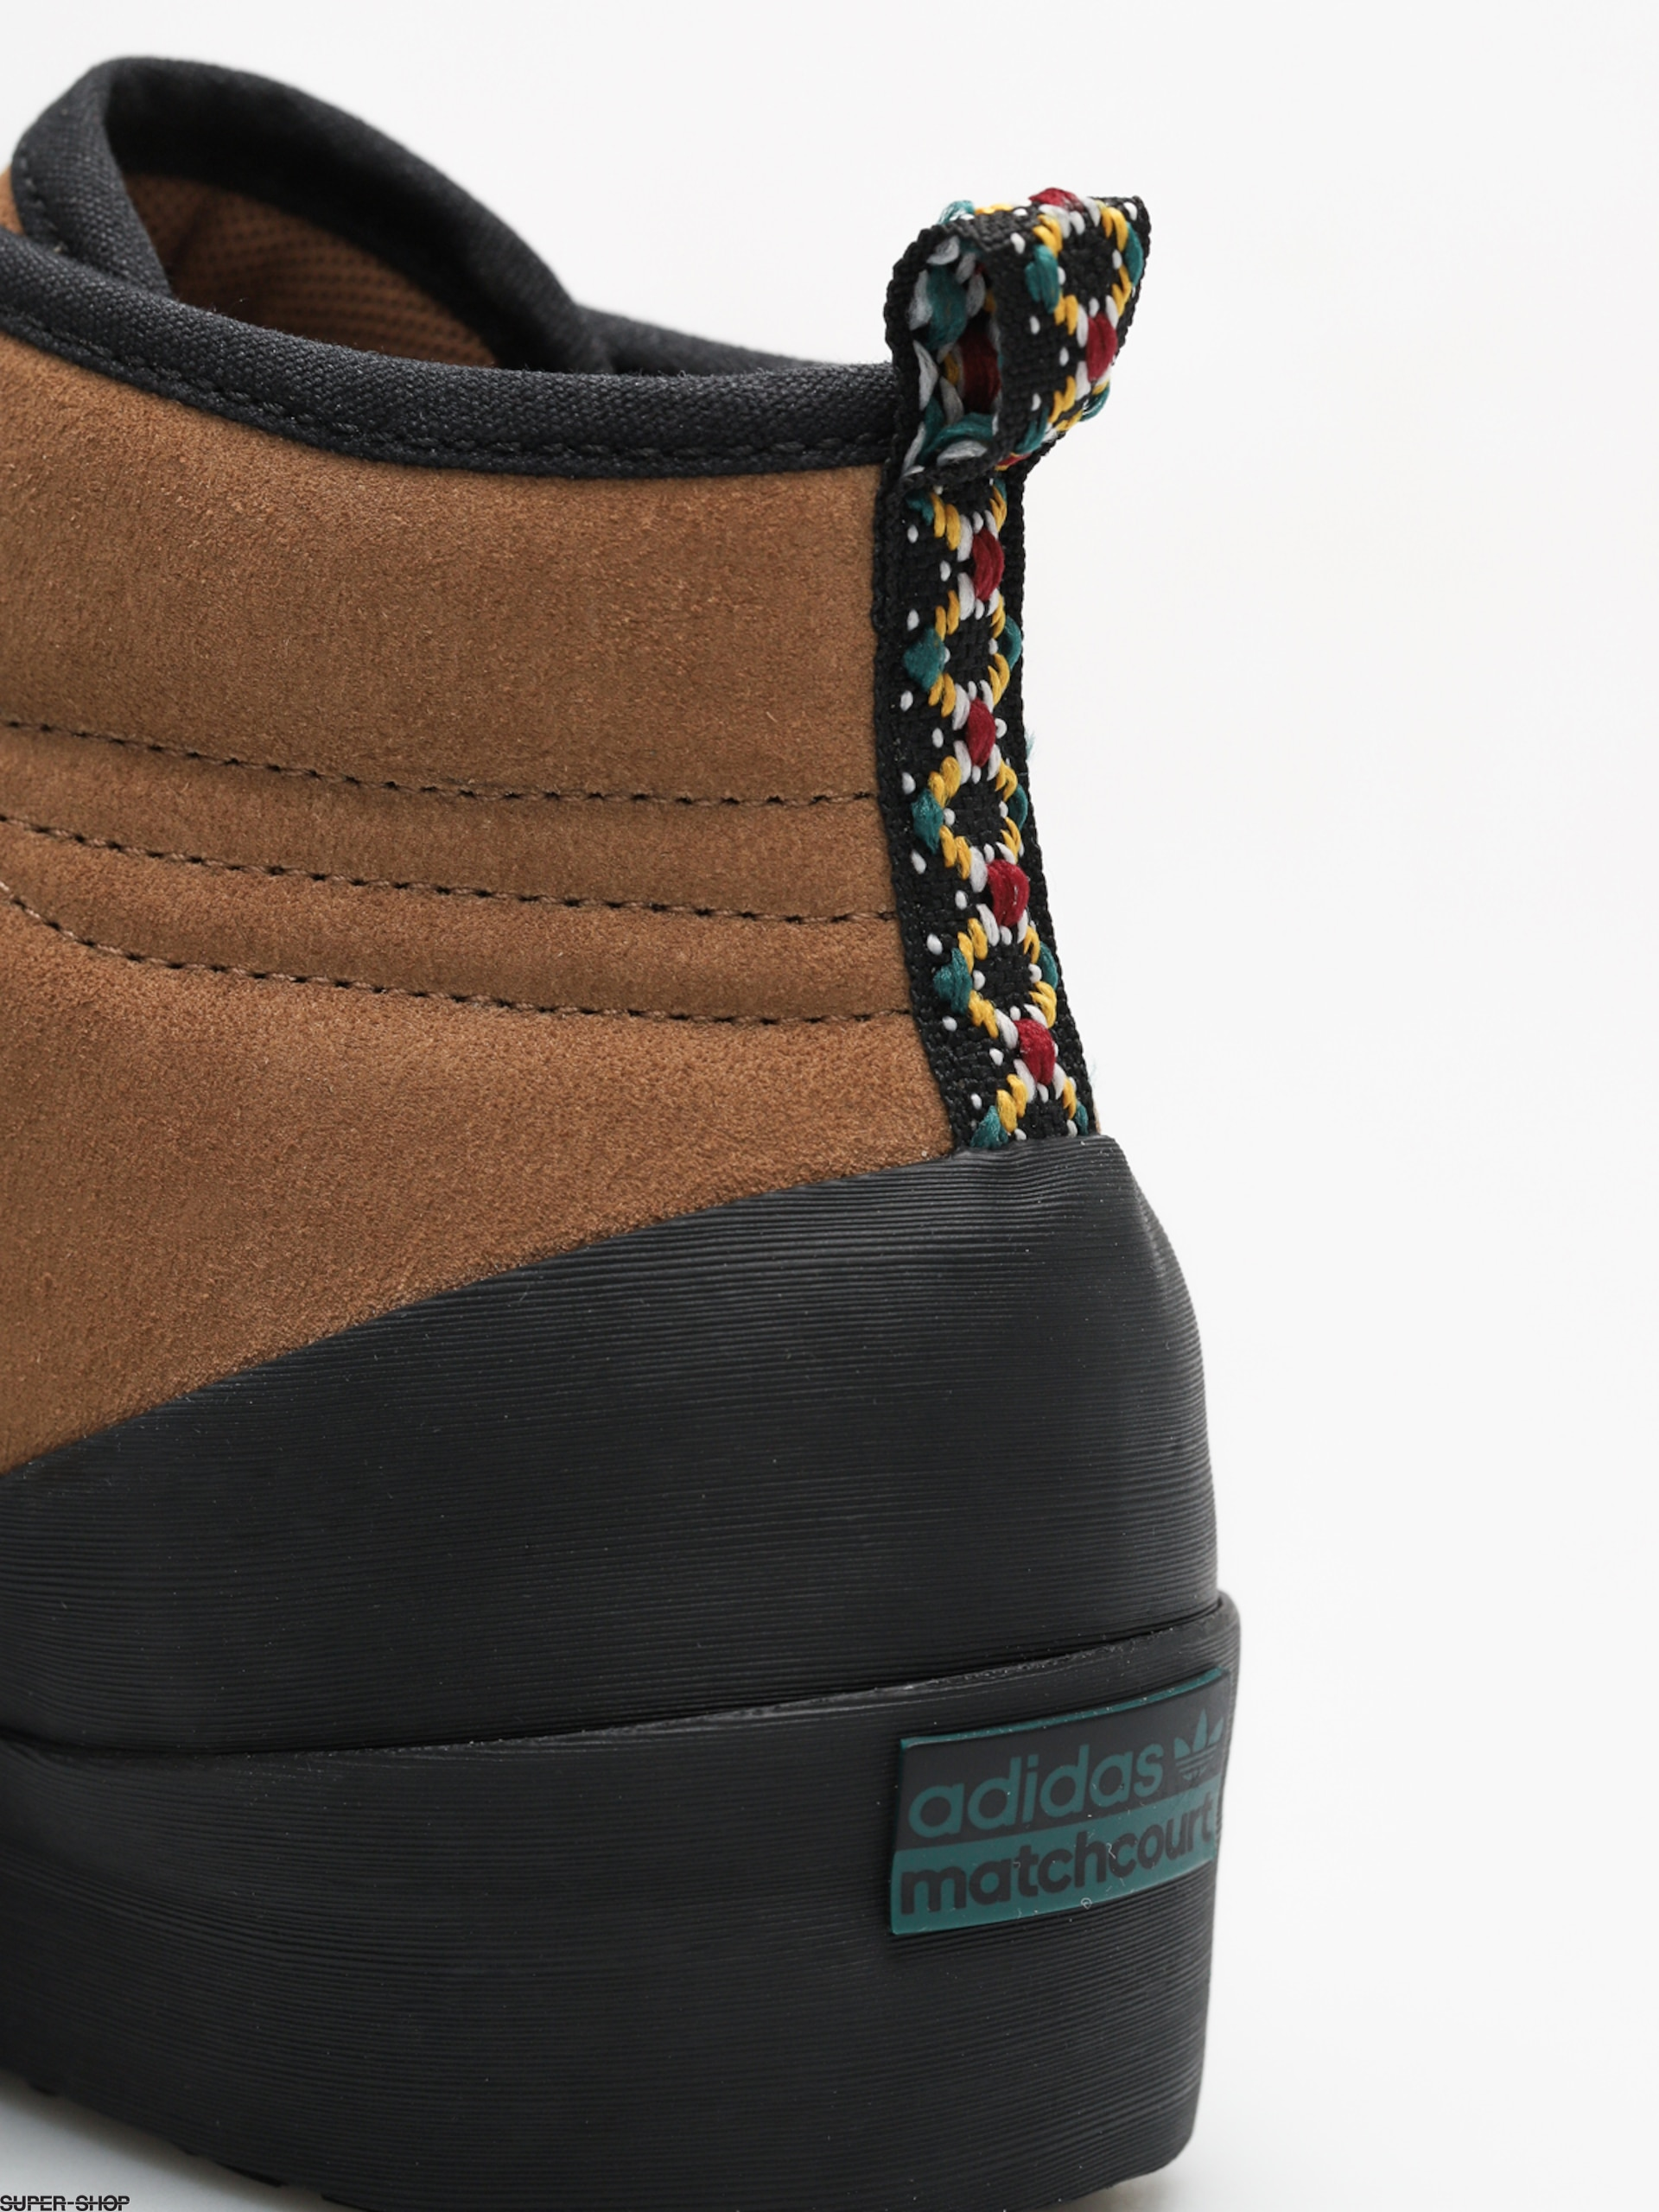 brand new e64ab ff8d3 adidas Shoes Matchcourt High Rx3 (rawdesnobgrncblack)